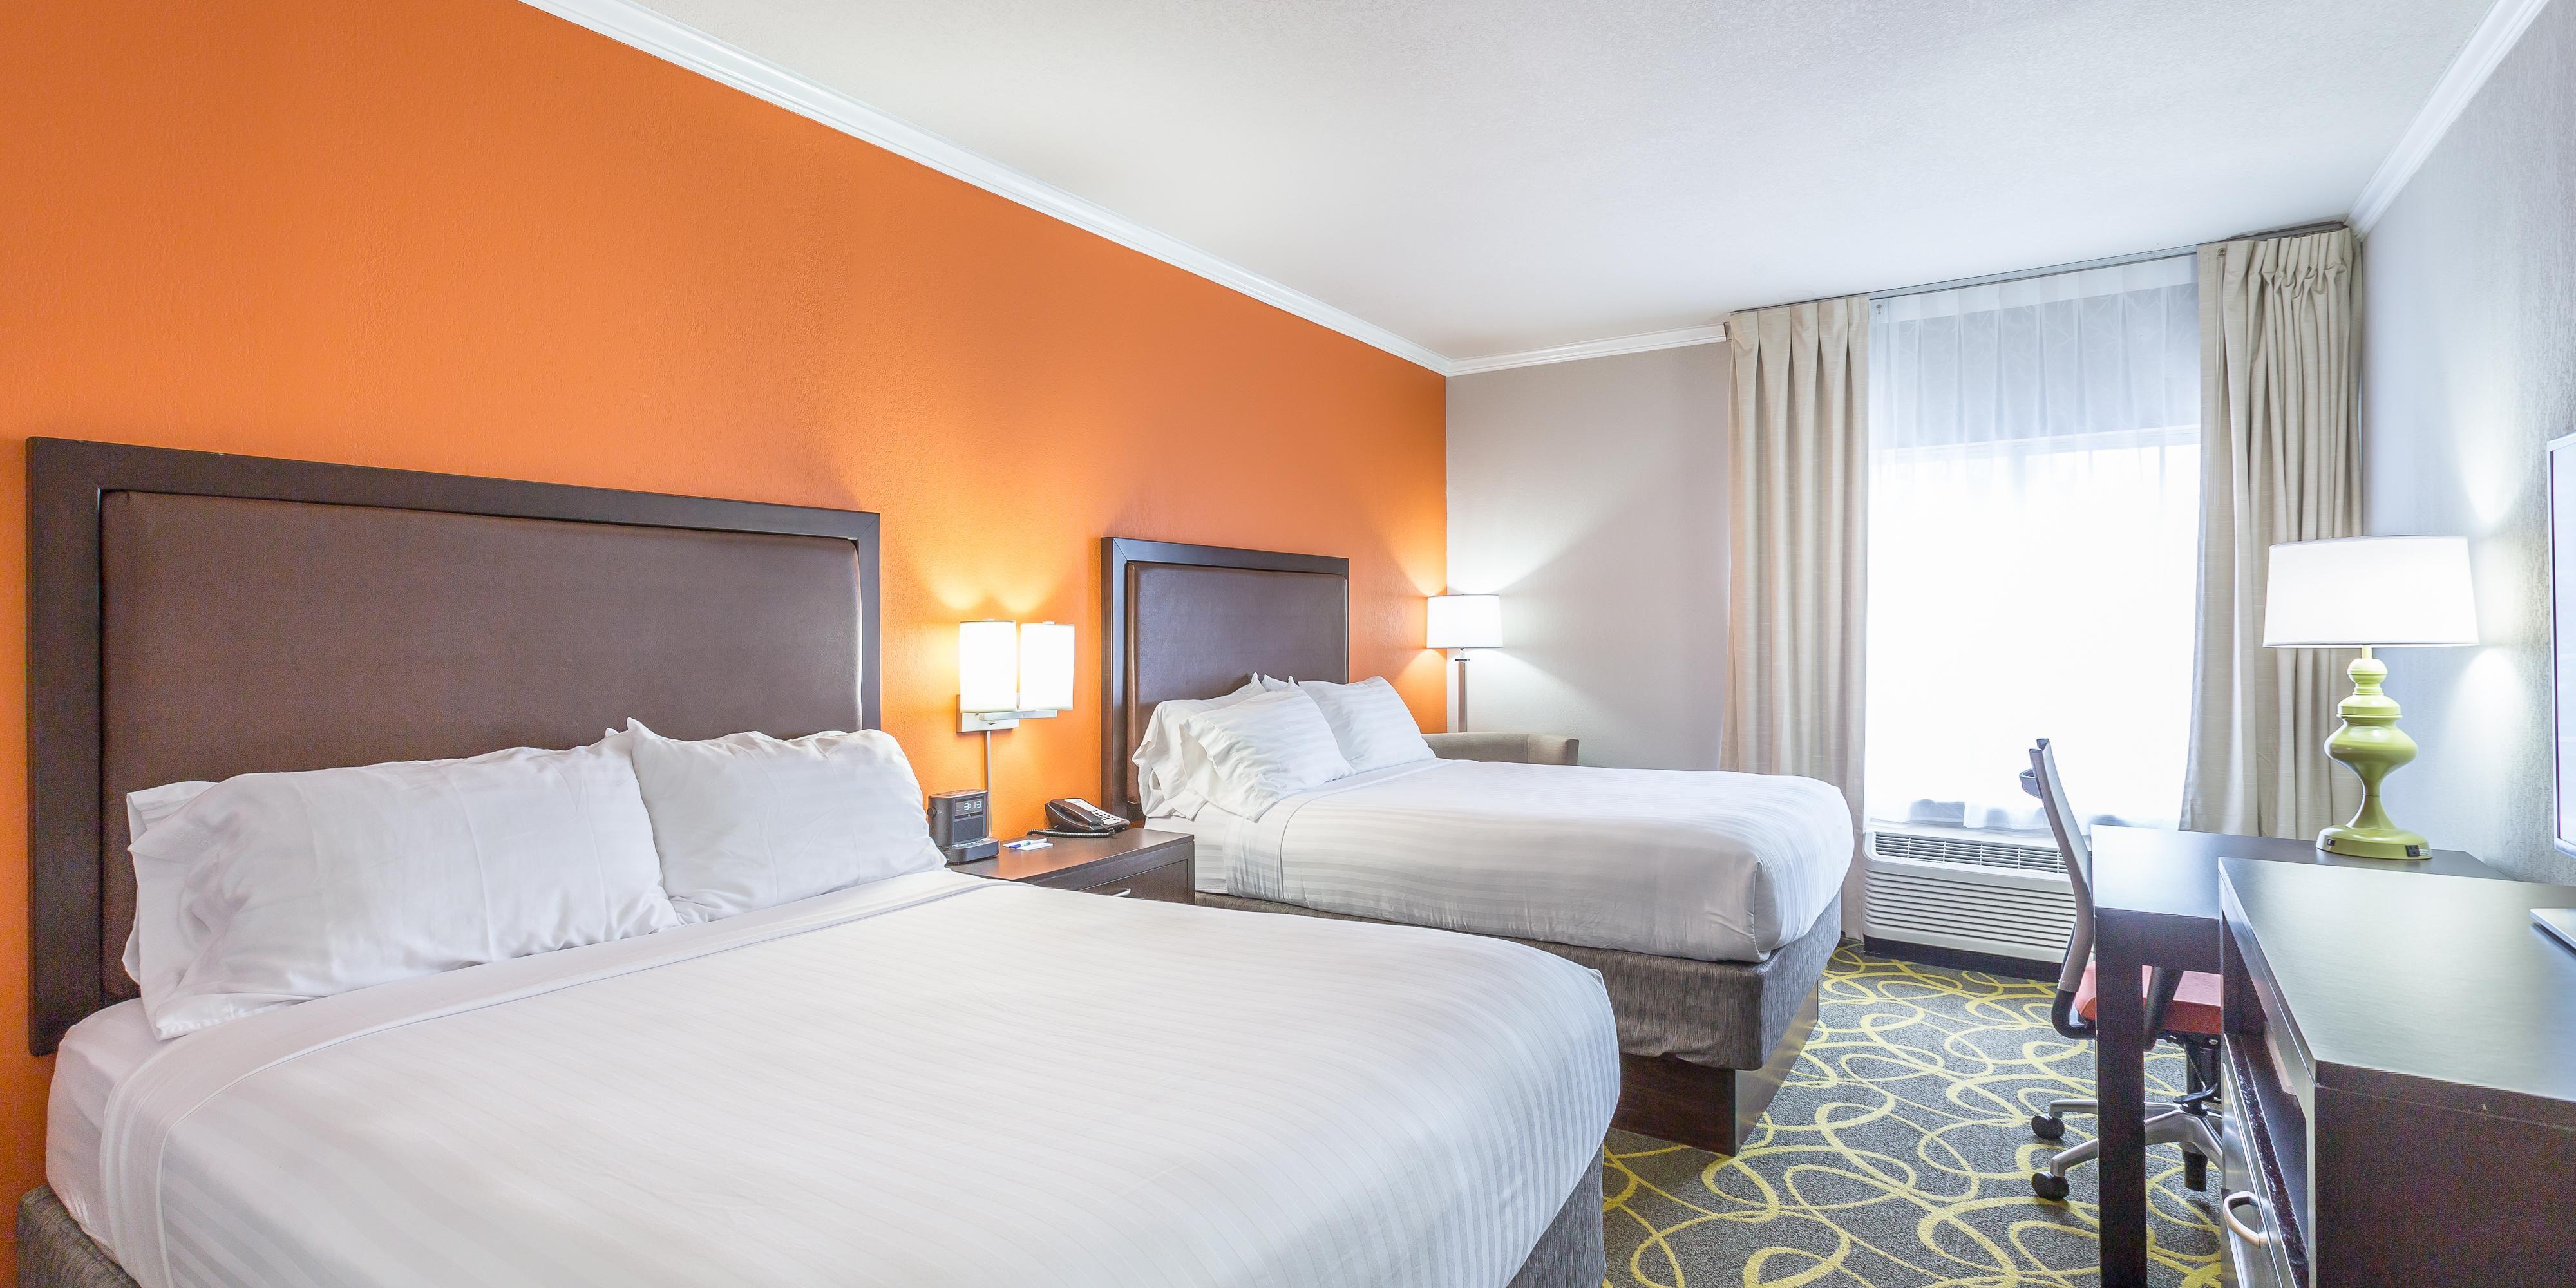 Holiday Inn Express St Simons Island 4842649043 2x1